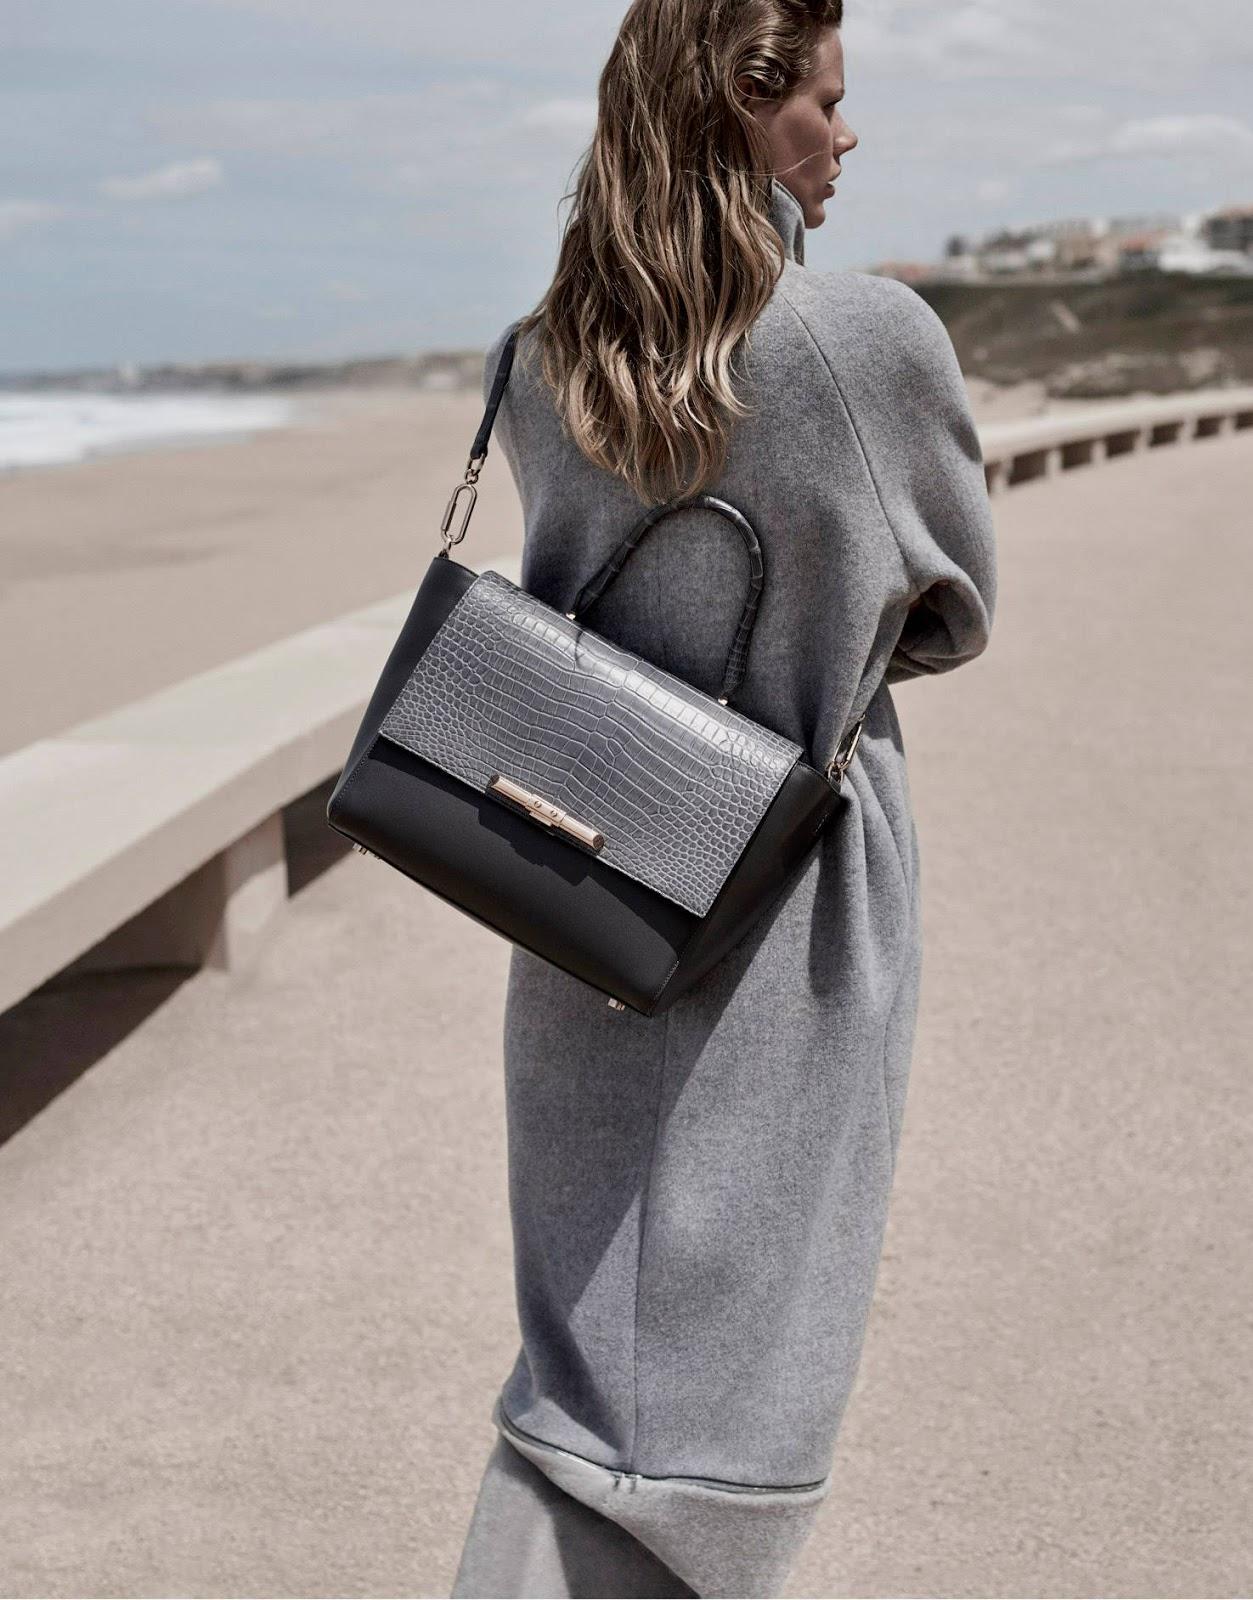 Amanda Wakeley Autumn/Winter 2015 collection featured in Vogue UK August 2015 (model: Marlijn Hoek, photography: Jen Carey) via fashioned by love, british fashion blog